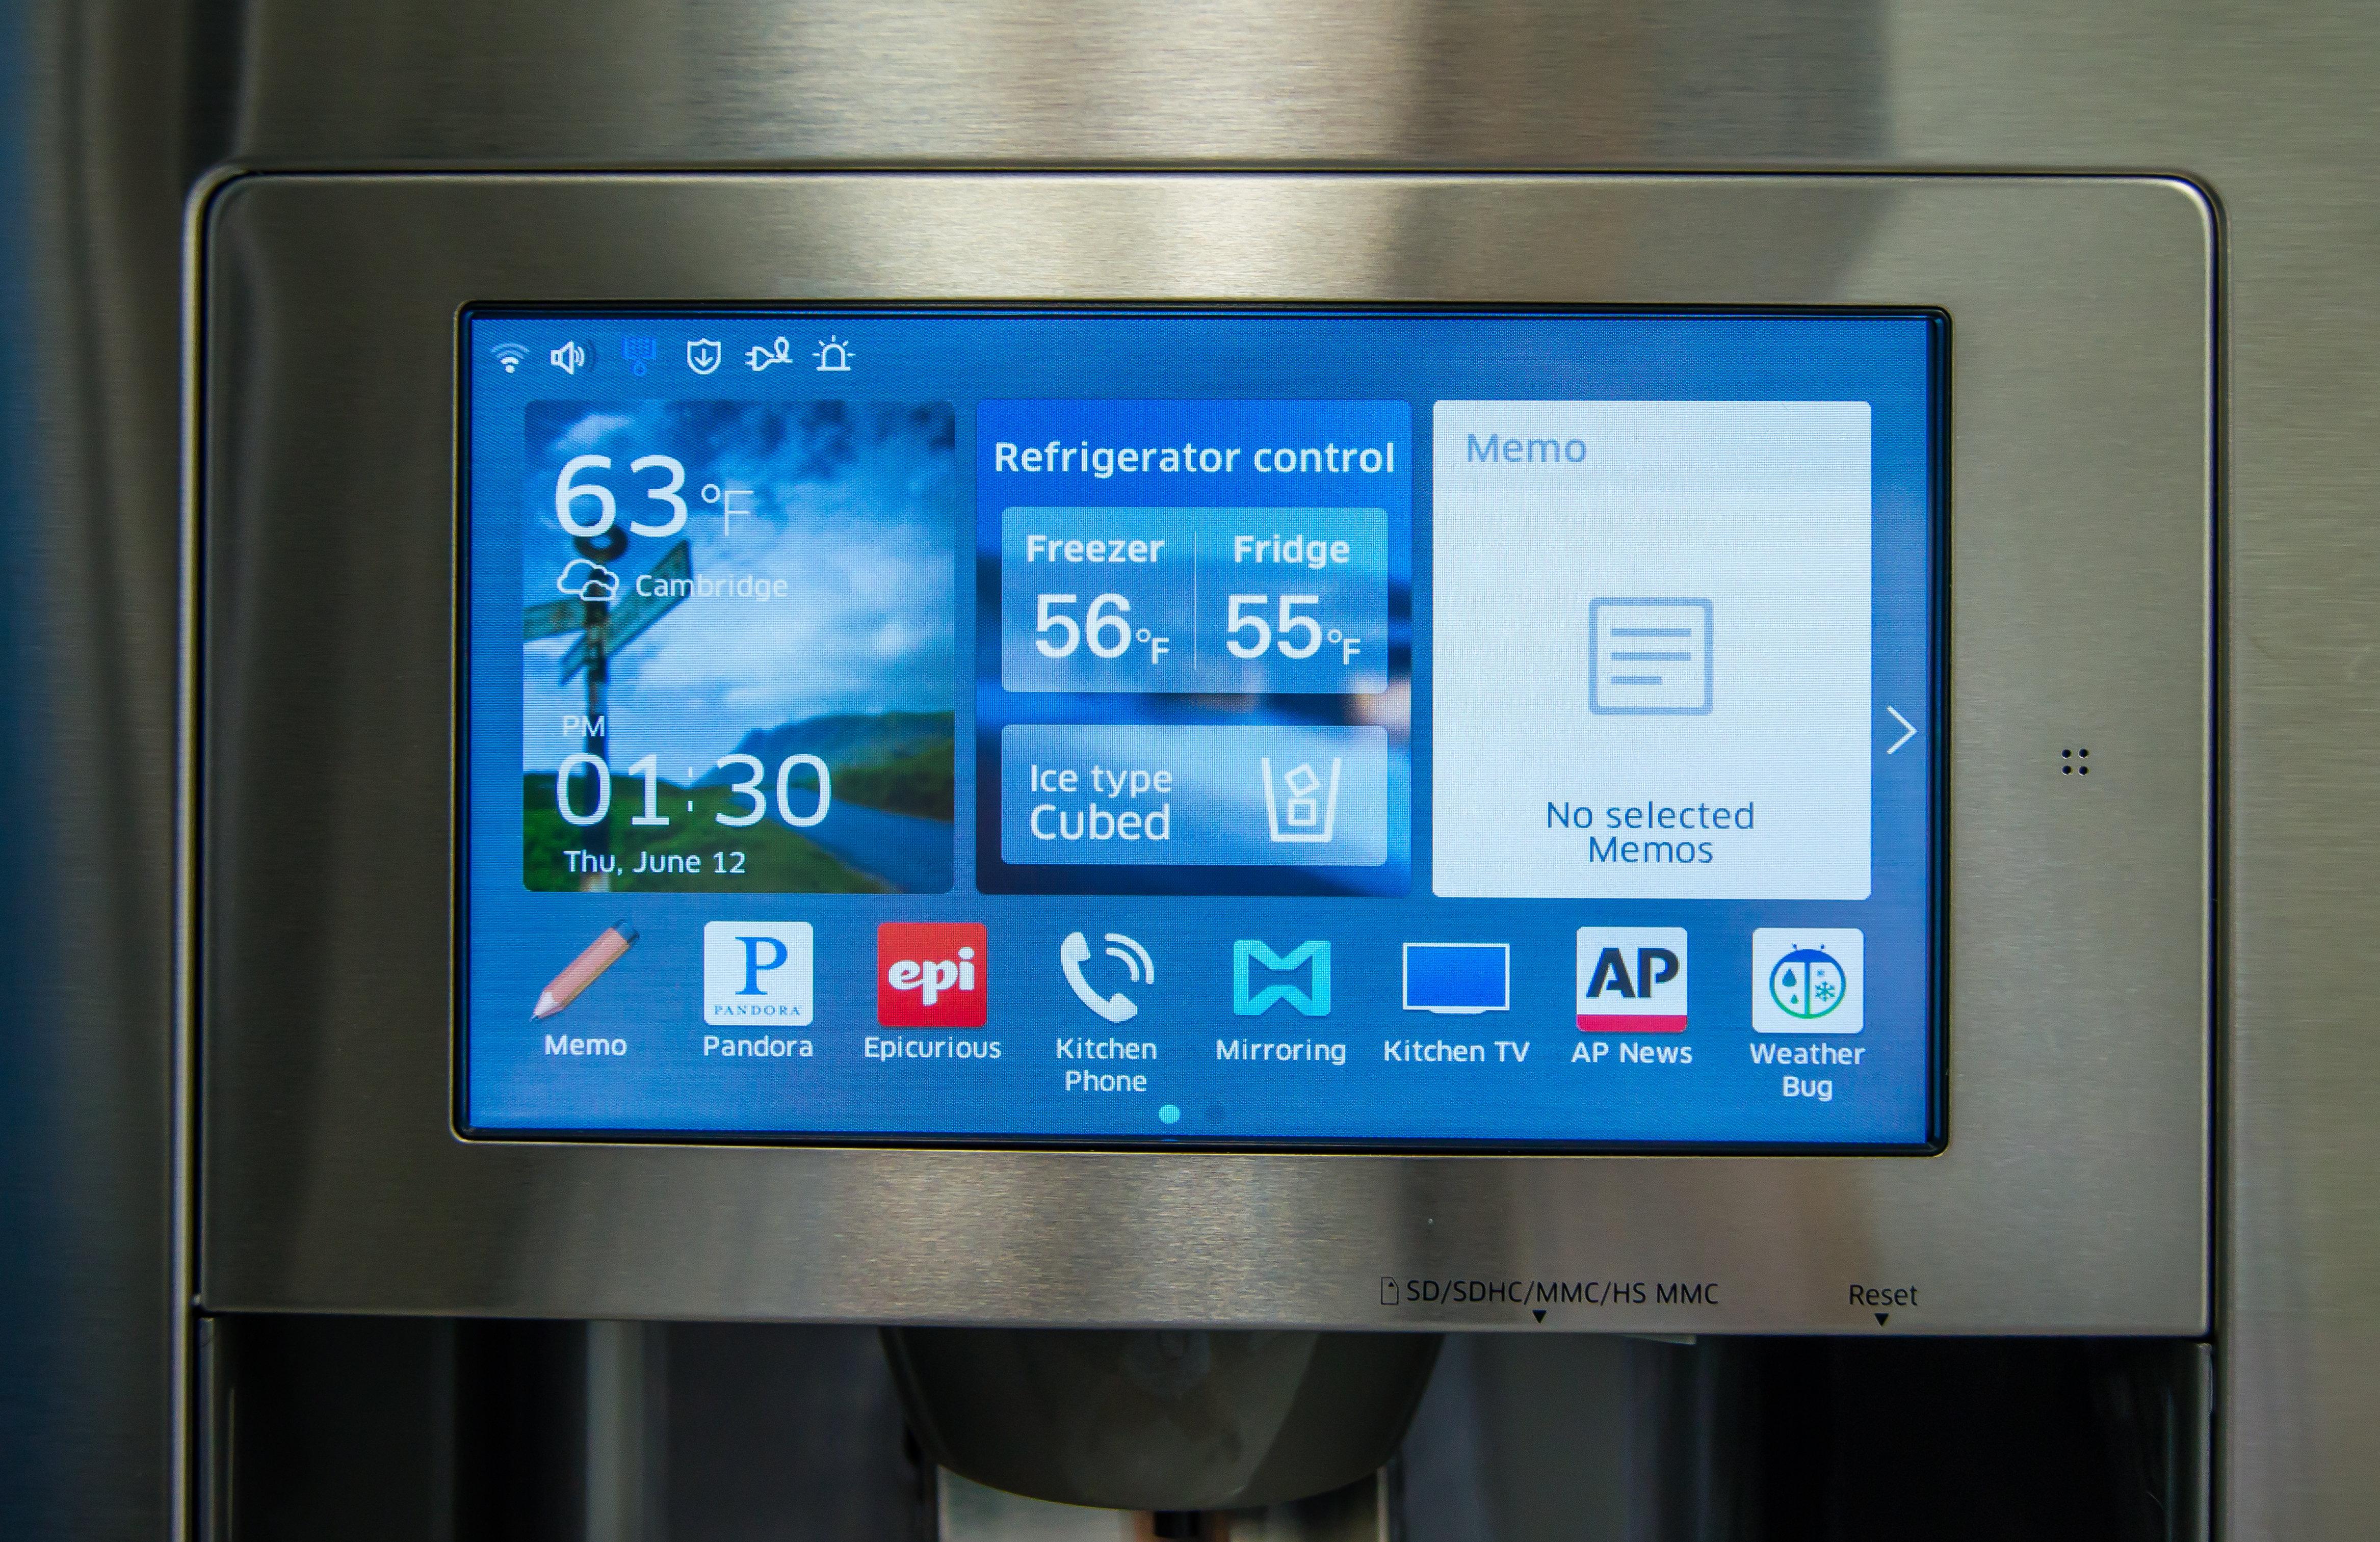 Samsung Rf28hmelbsr Smart Refrigerator Review Reviewed